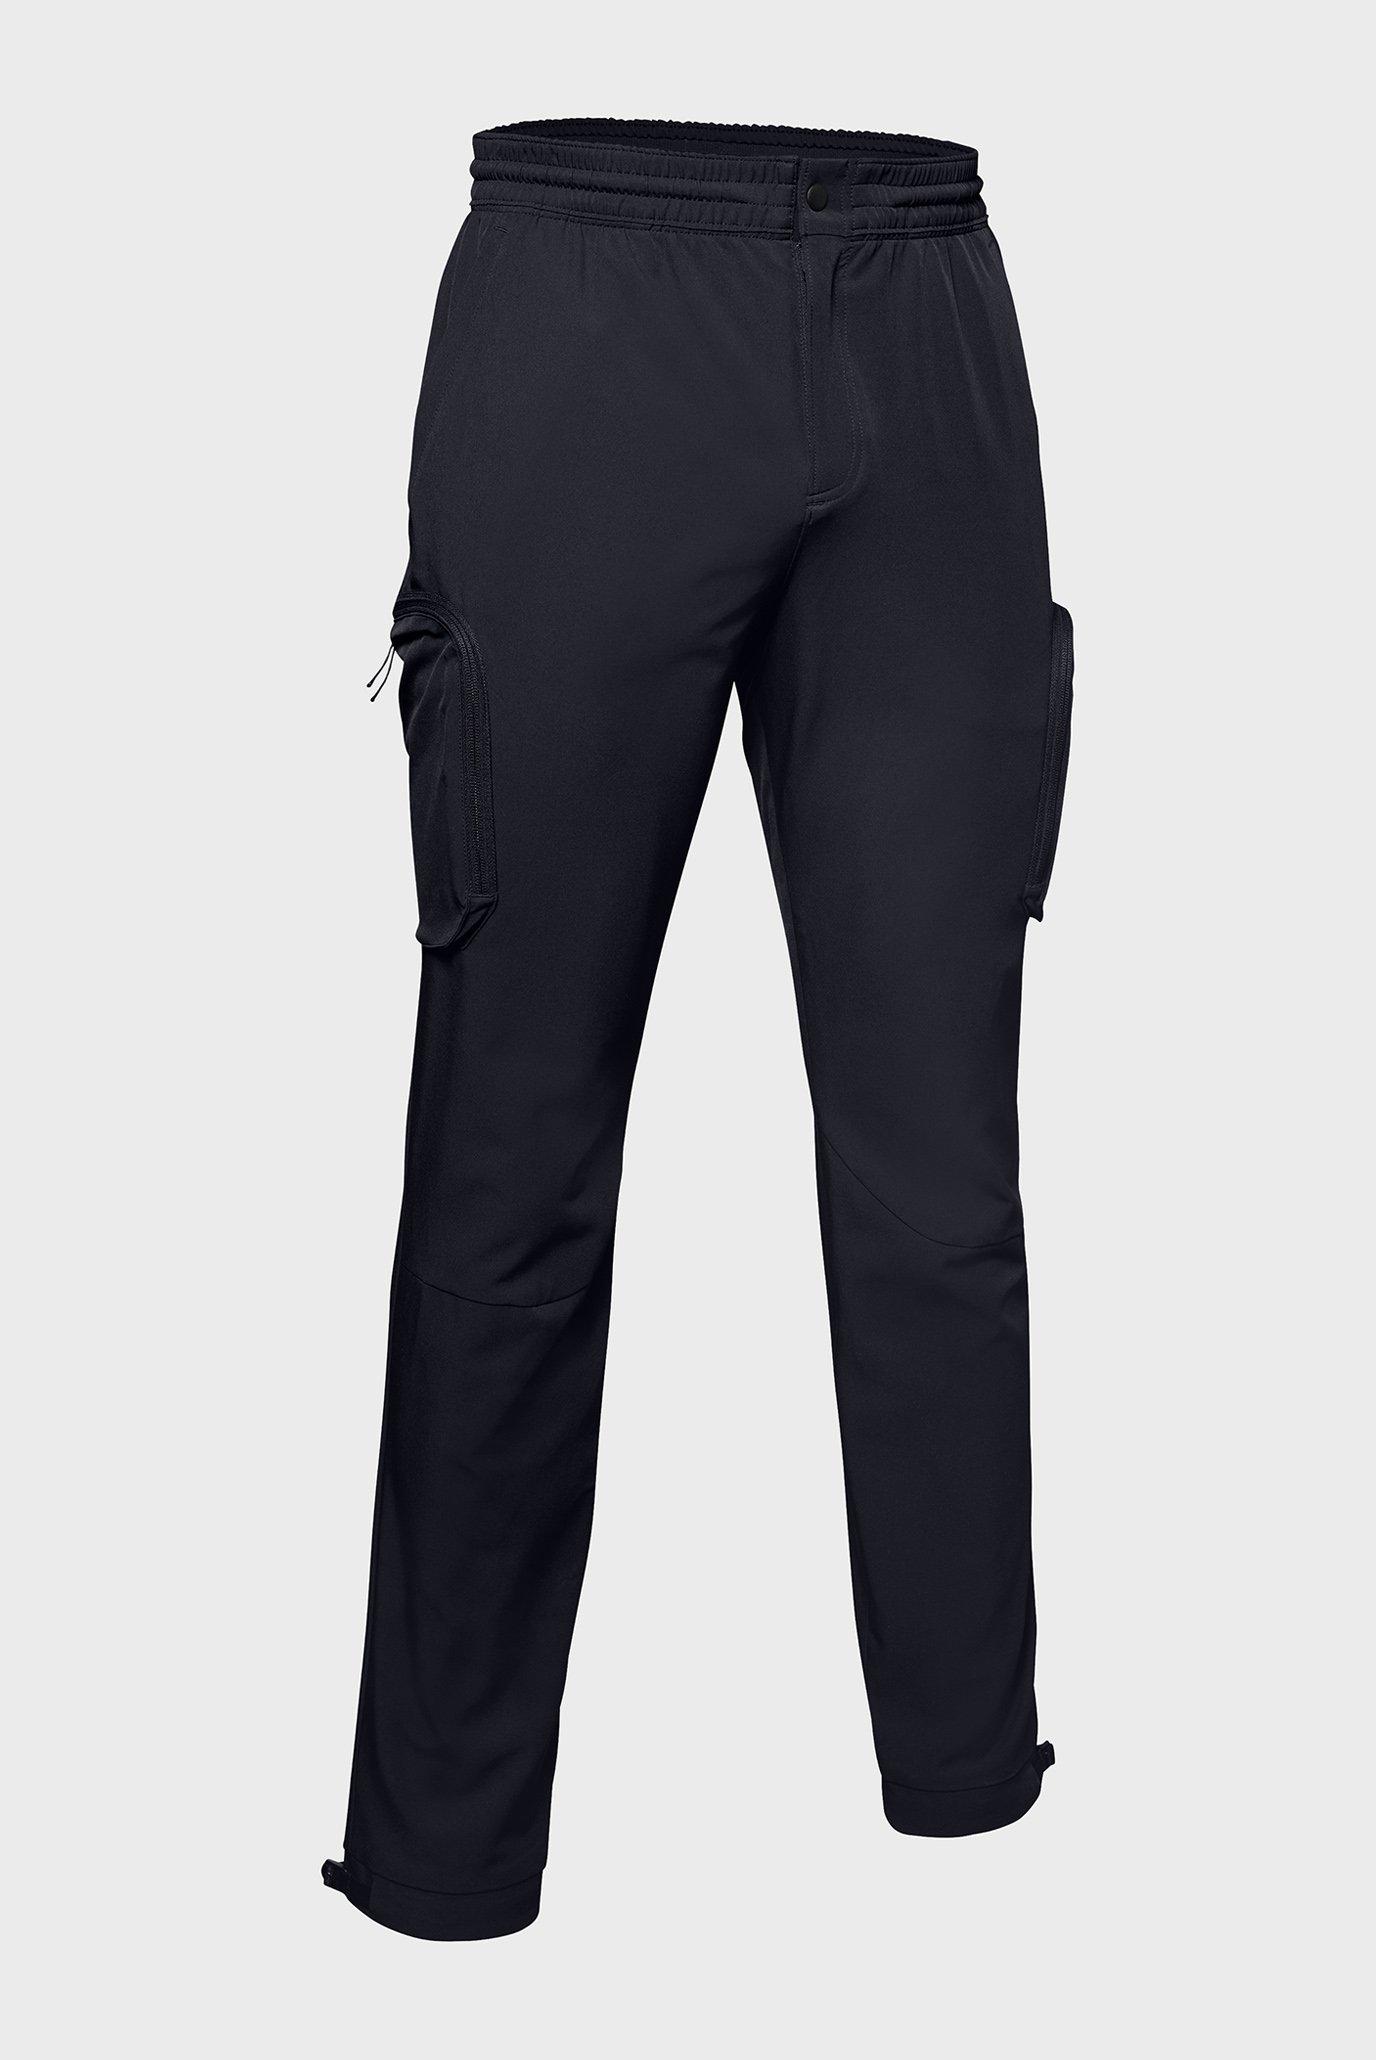 Мужские черные брюки UNSTOPPABLE WOVEN CARGO PANT Under Armour